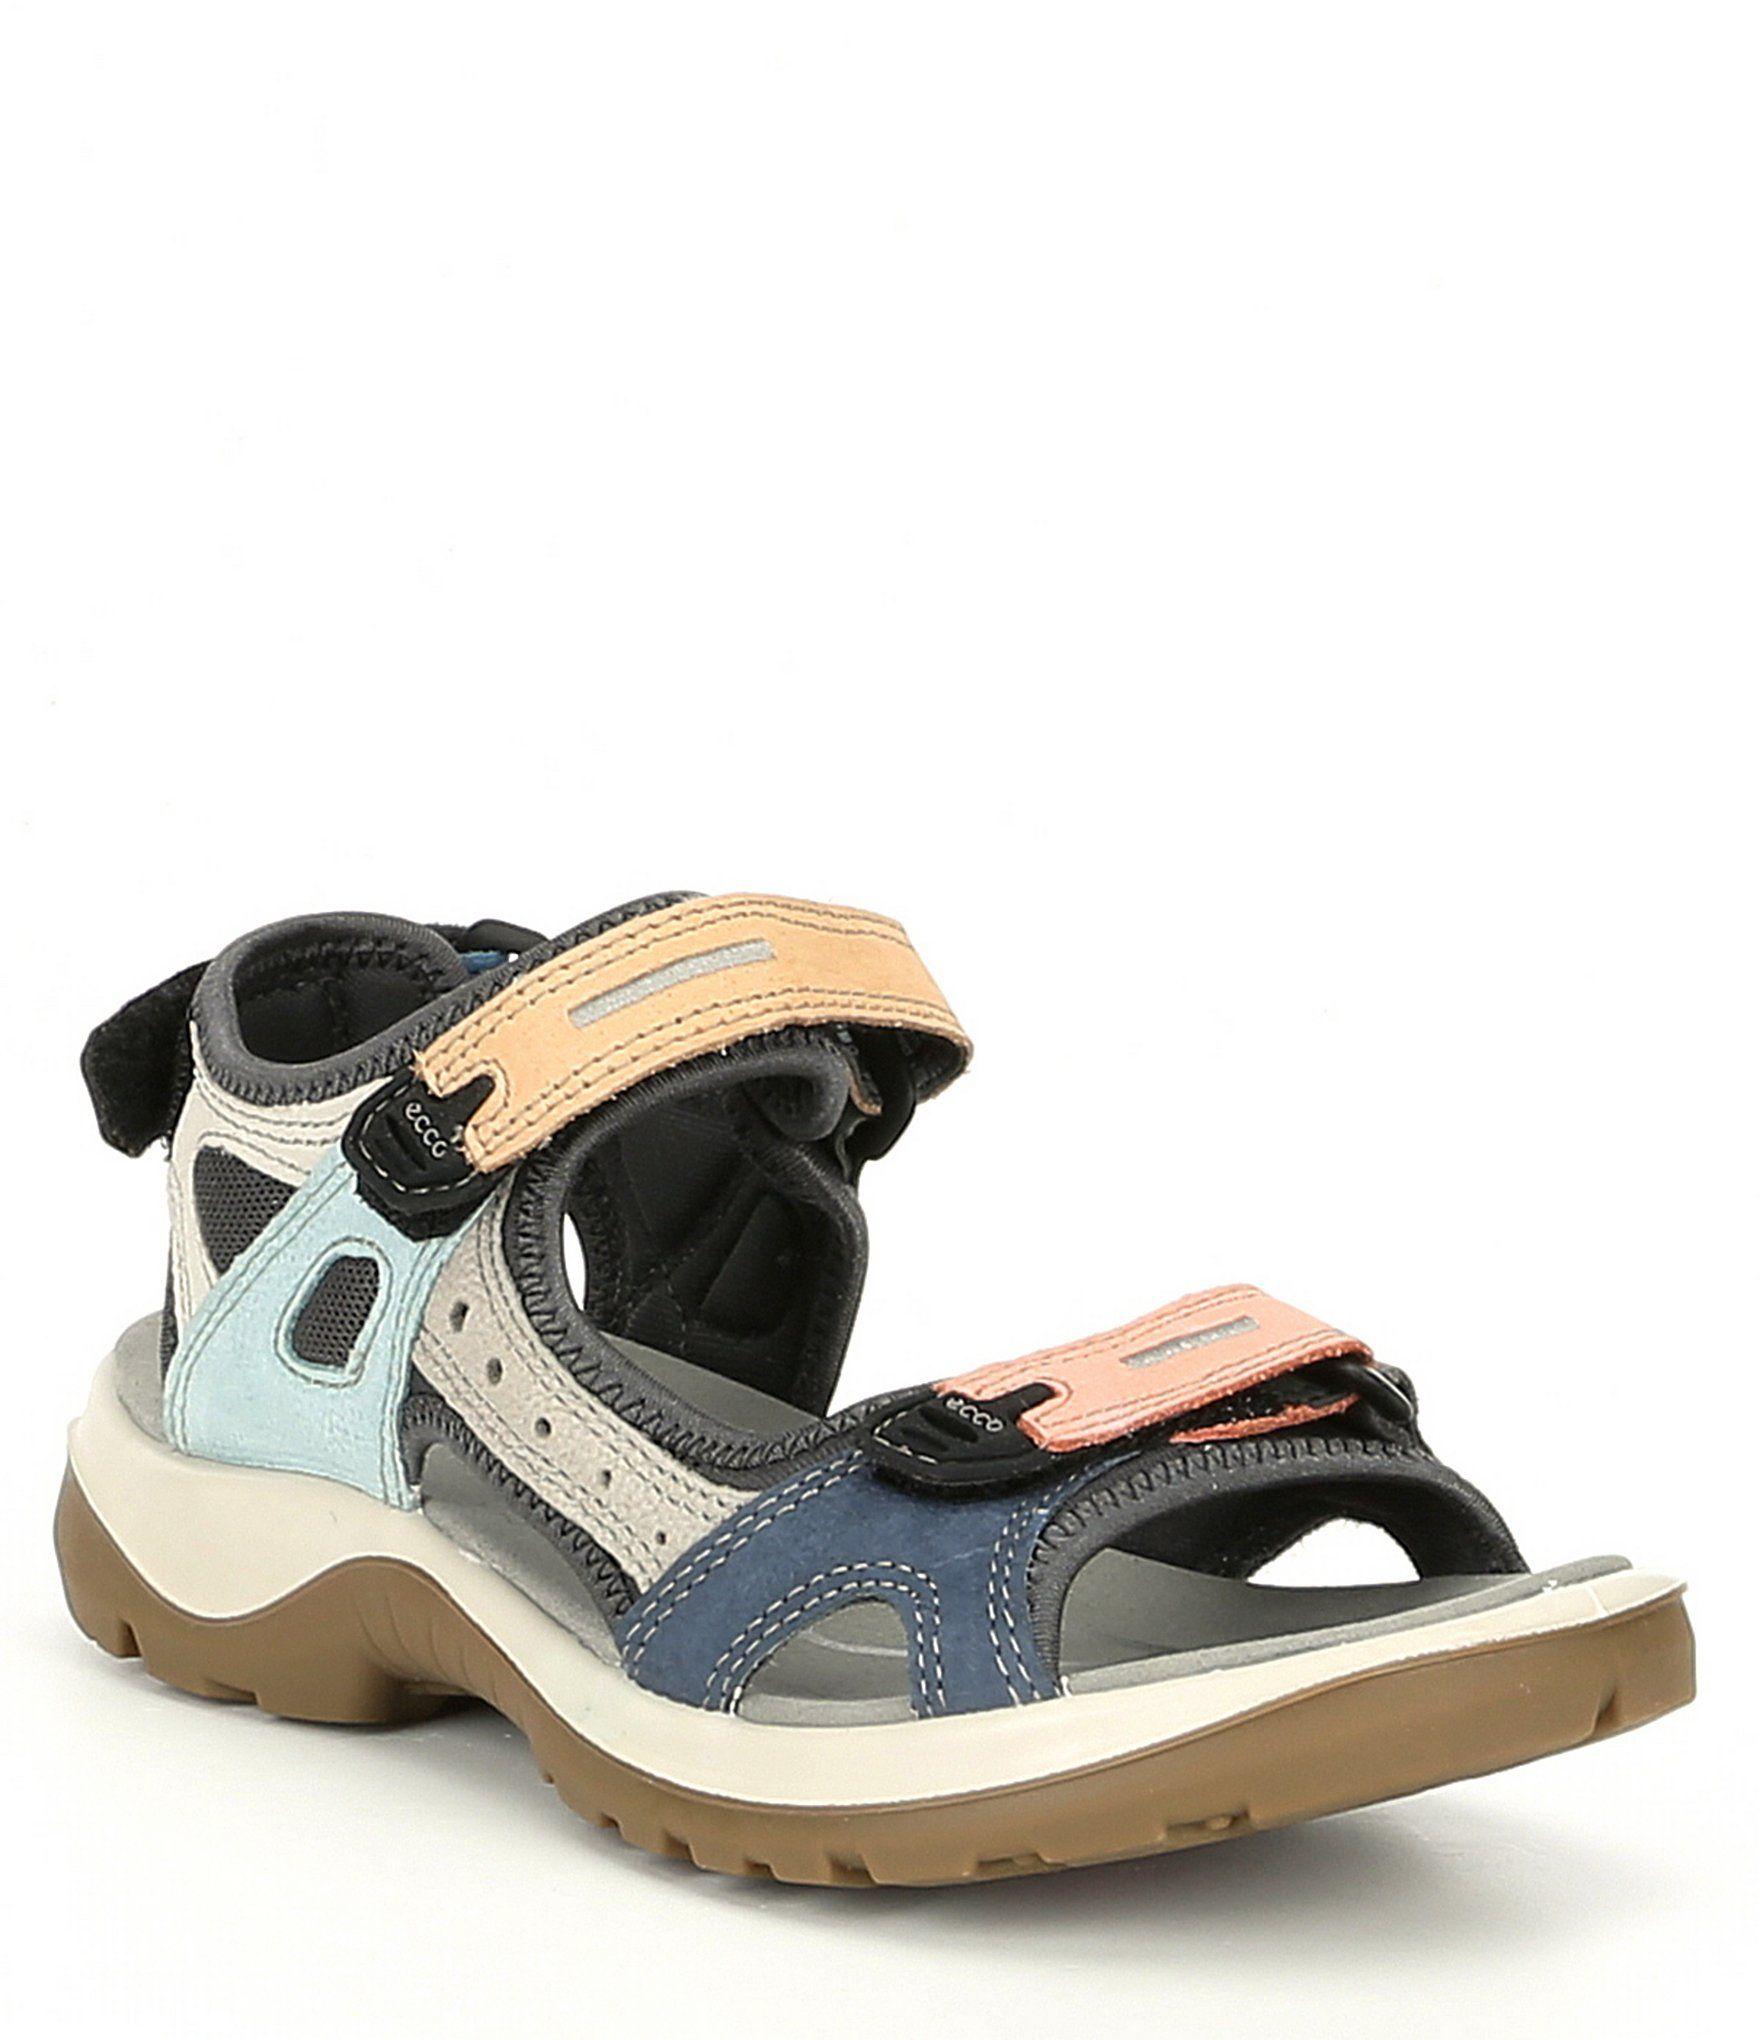 ecco womens sandals sale \u003e Clearance shop